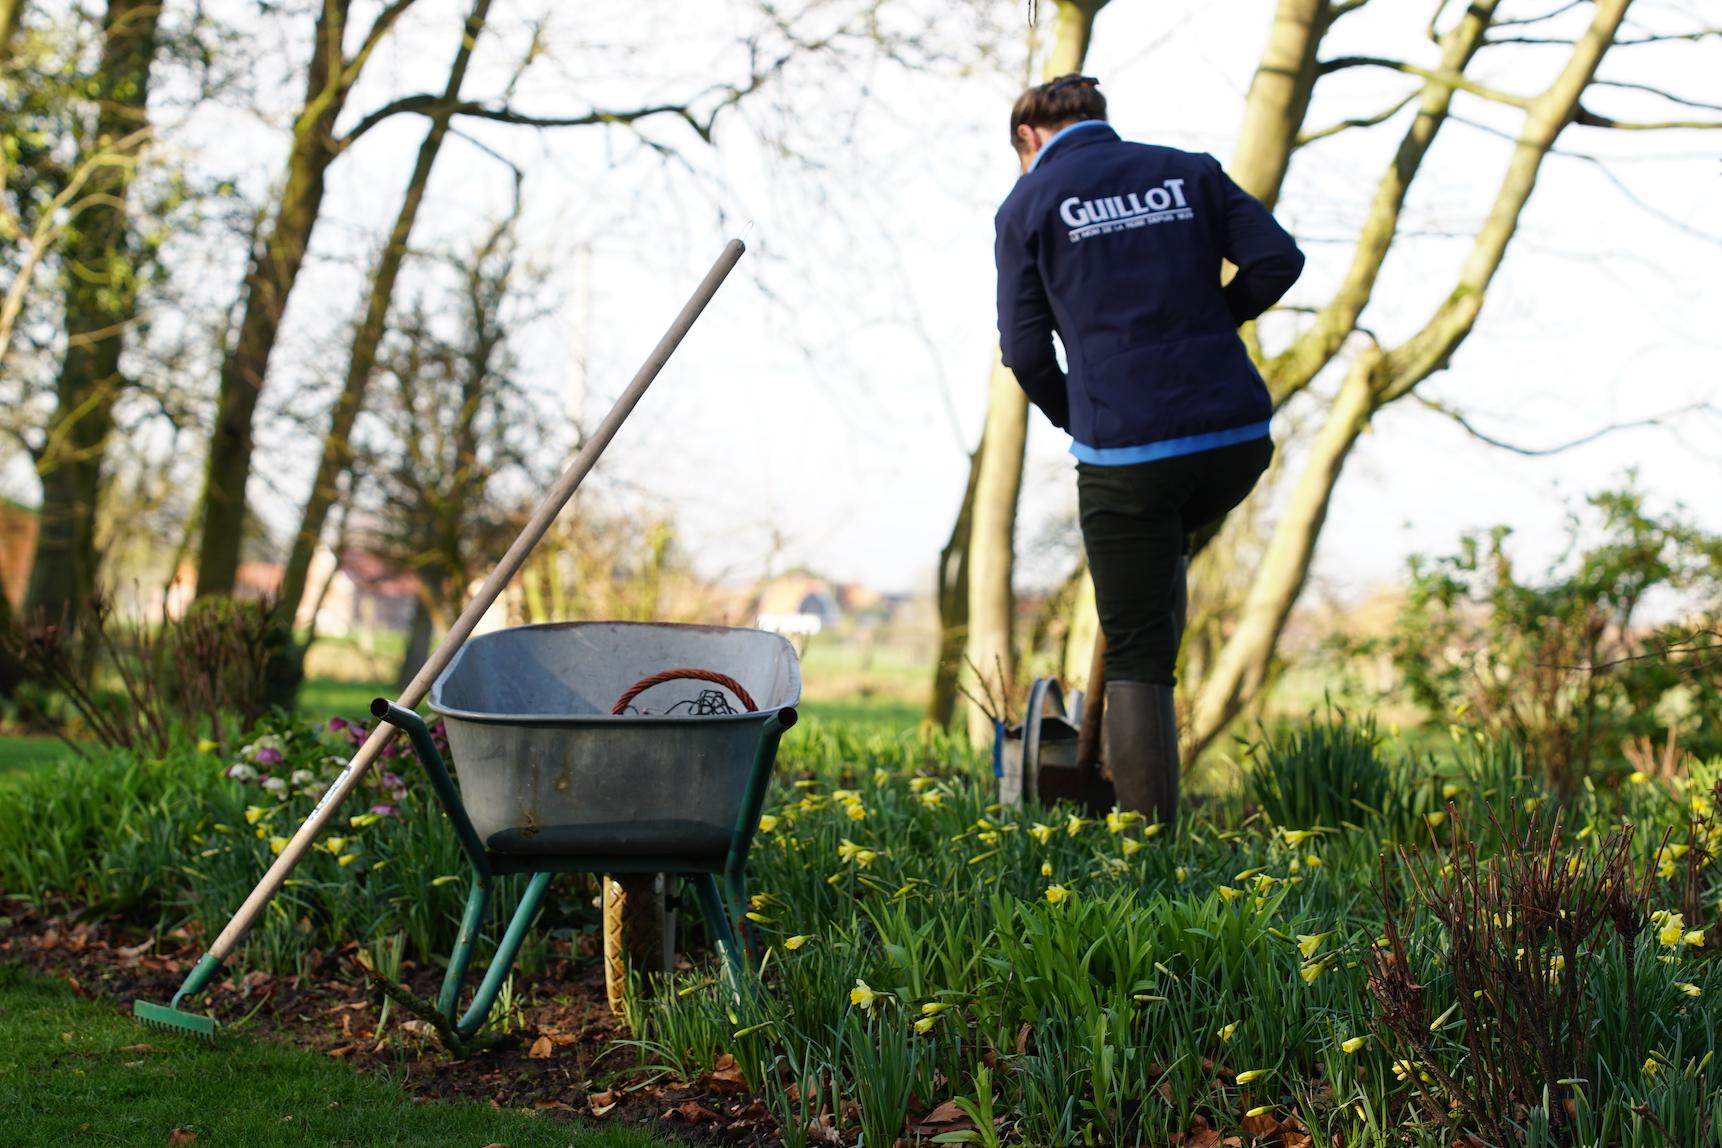 Plantation de rosiers racines nues jusqu'en mars-avril - Roses Guillot®